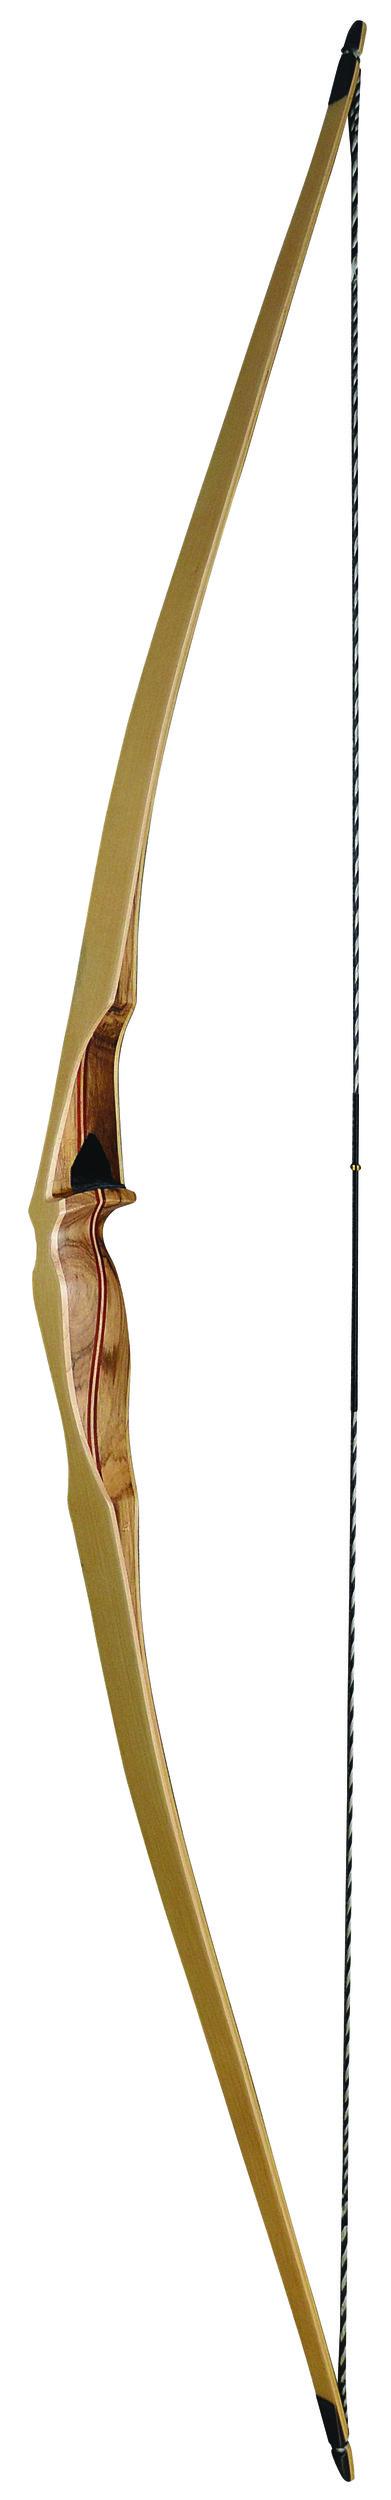 #2479 Yukon Hybrid Longbow thumbnail